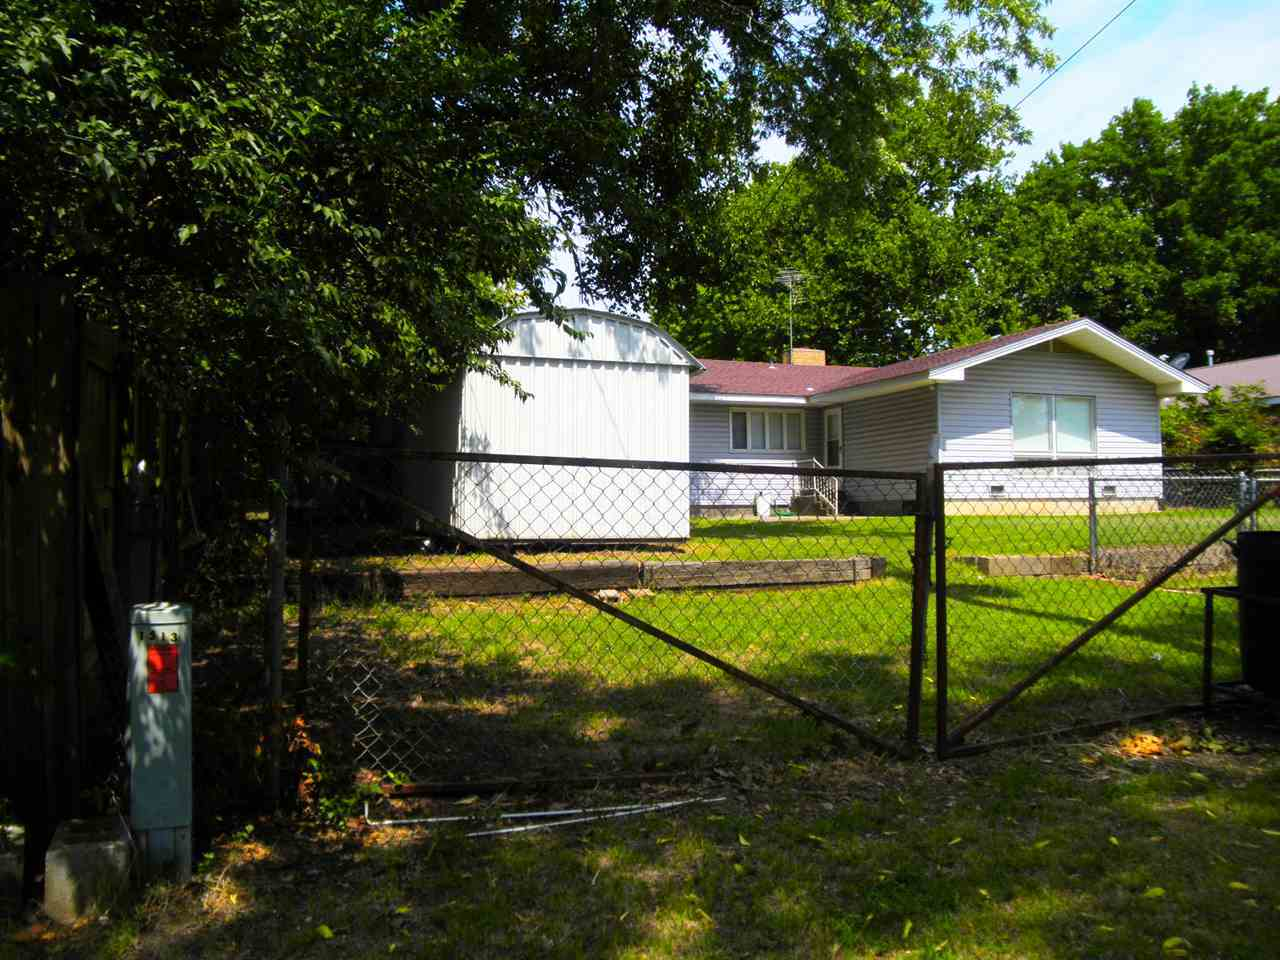 Sold Cross Sale W/ MLS | 1601 Blackard Ponca City, OK 74604 23